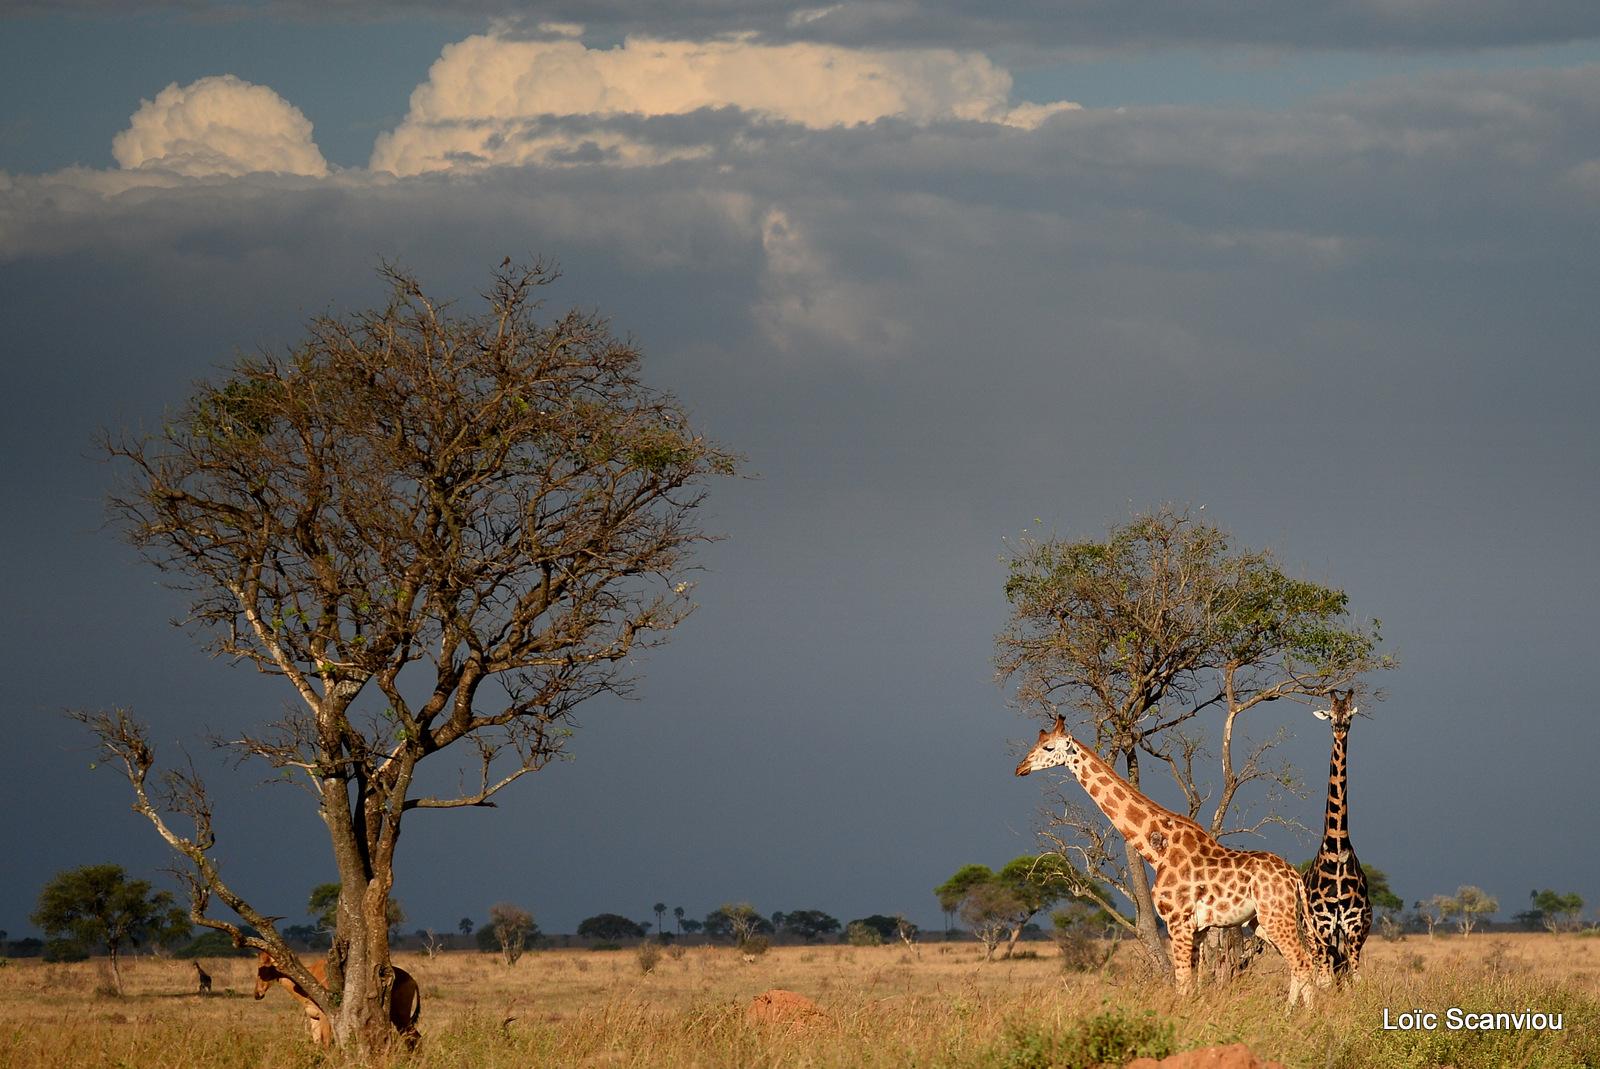 Girafe de Rothschild/Rothschild's Giraffe (17)